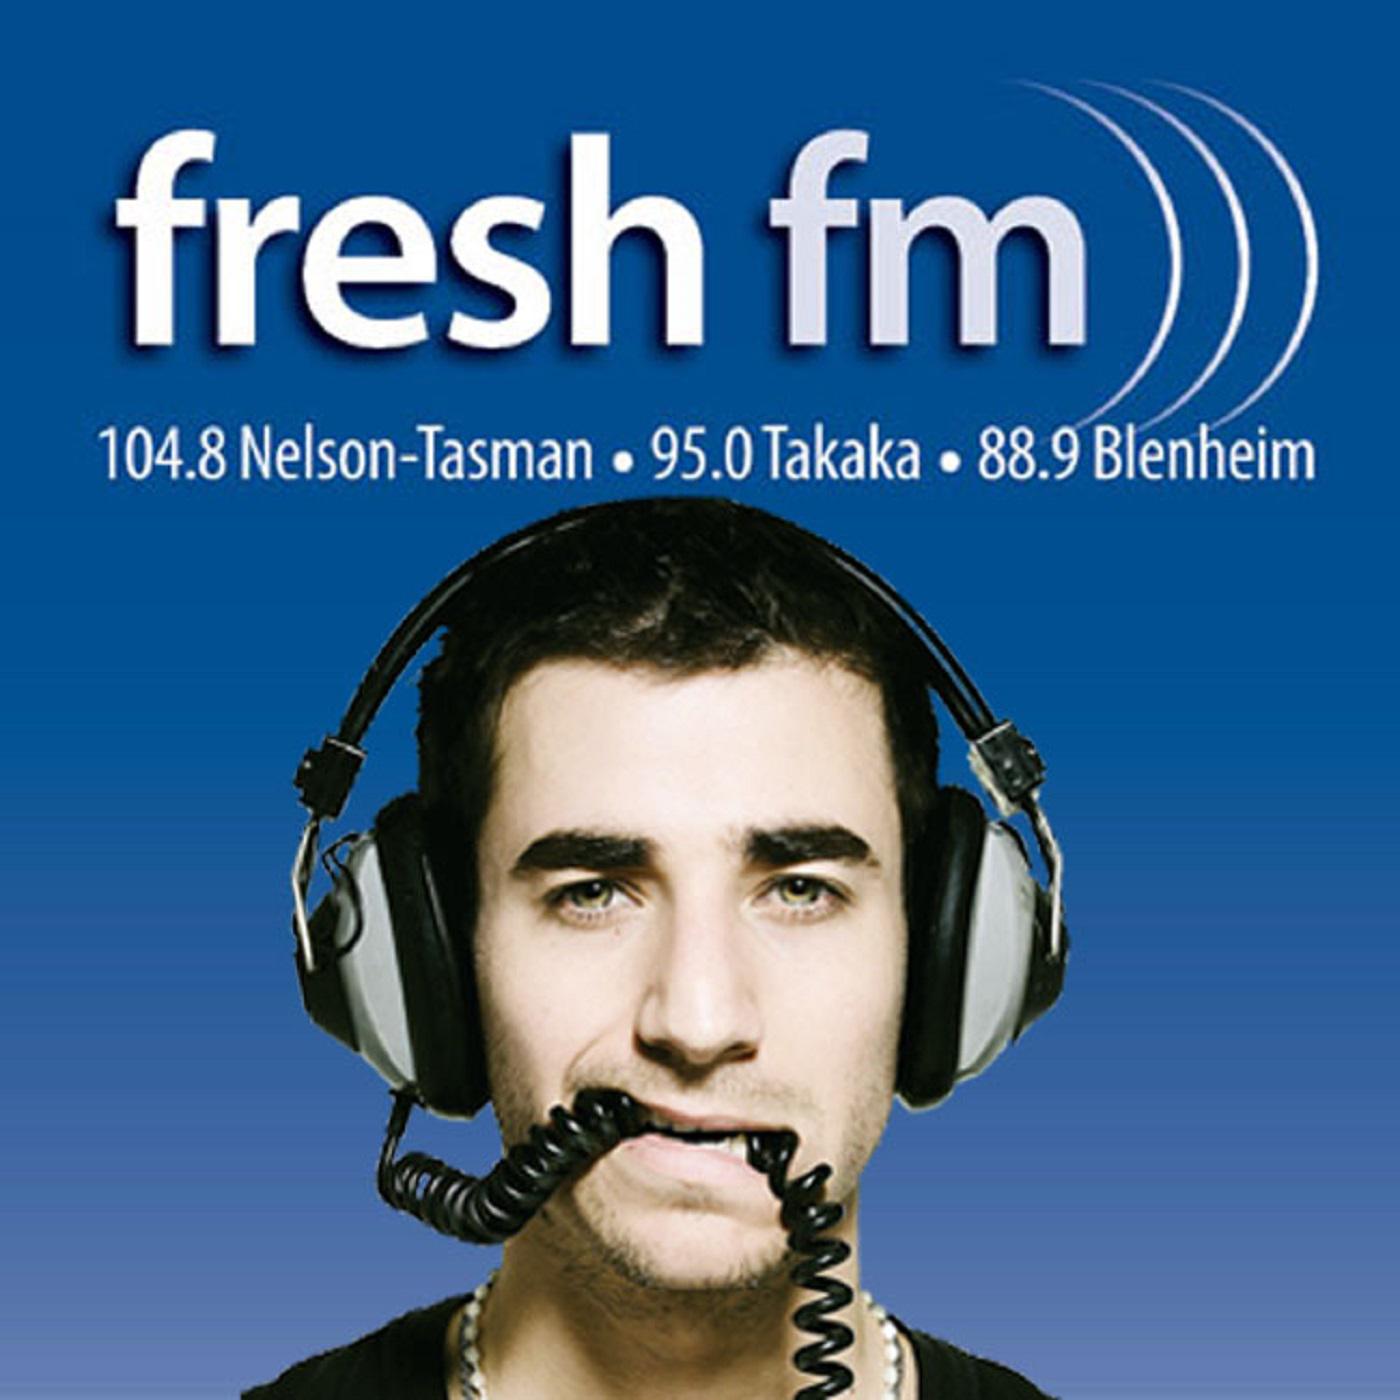 https://static.accessradio.org/StationFolder/freshfm/Images/Fresh-FM-Art140022.png